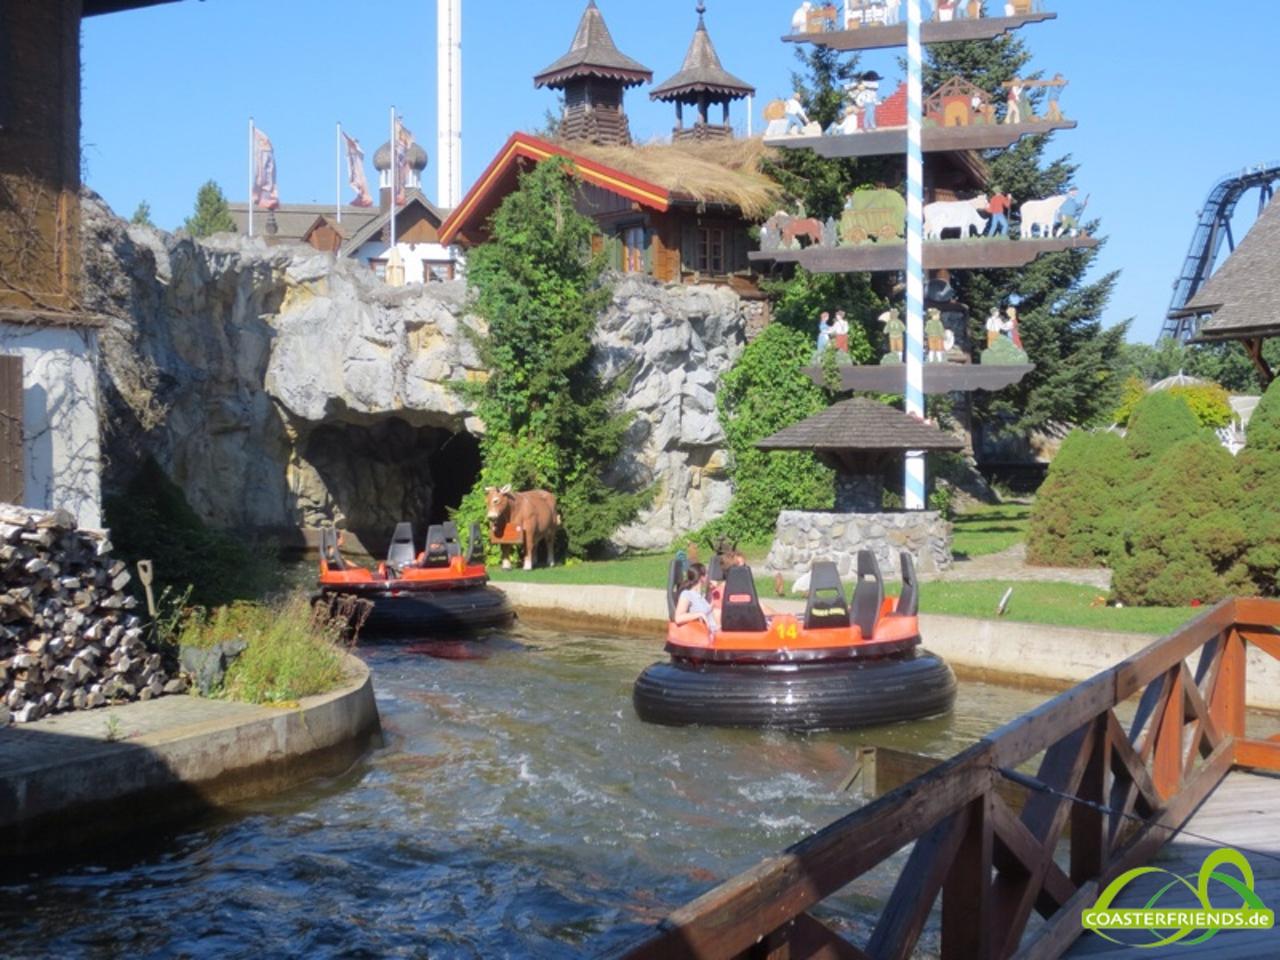 Europa - https://coasterfriends.de/joomla//images/pcp_parkdetails/europa/o1202_heide_park_resort/content3.jpg